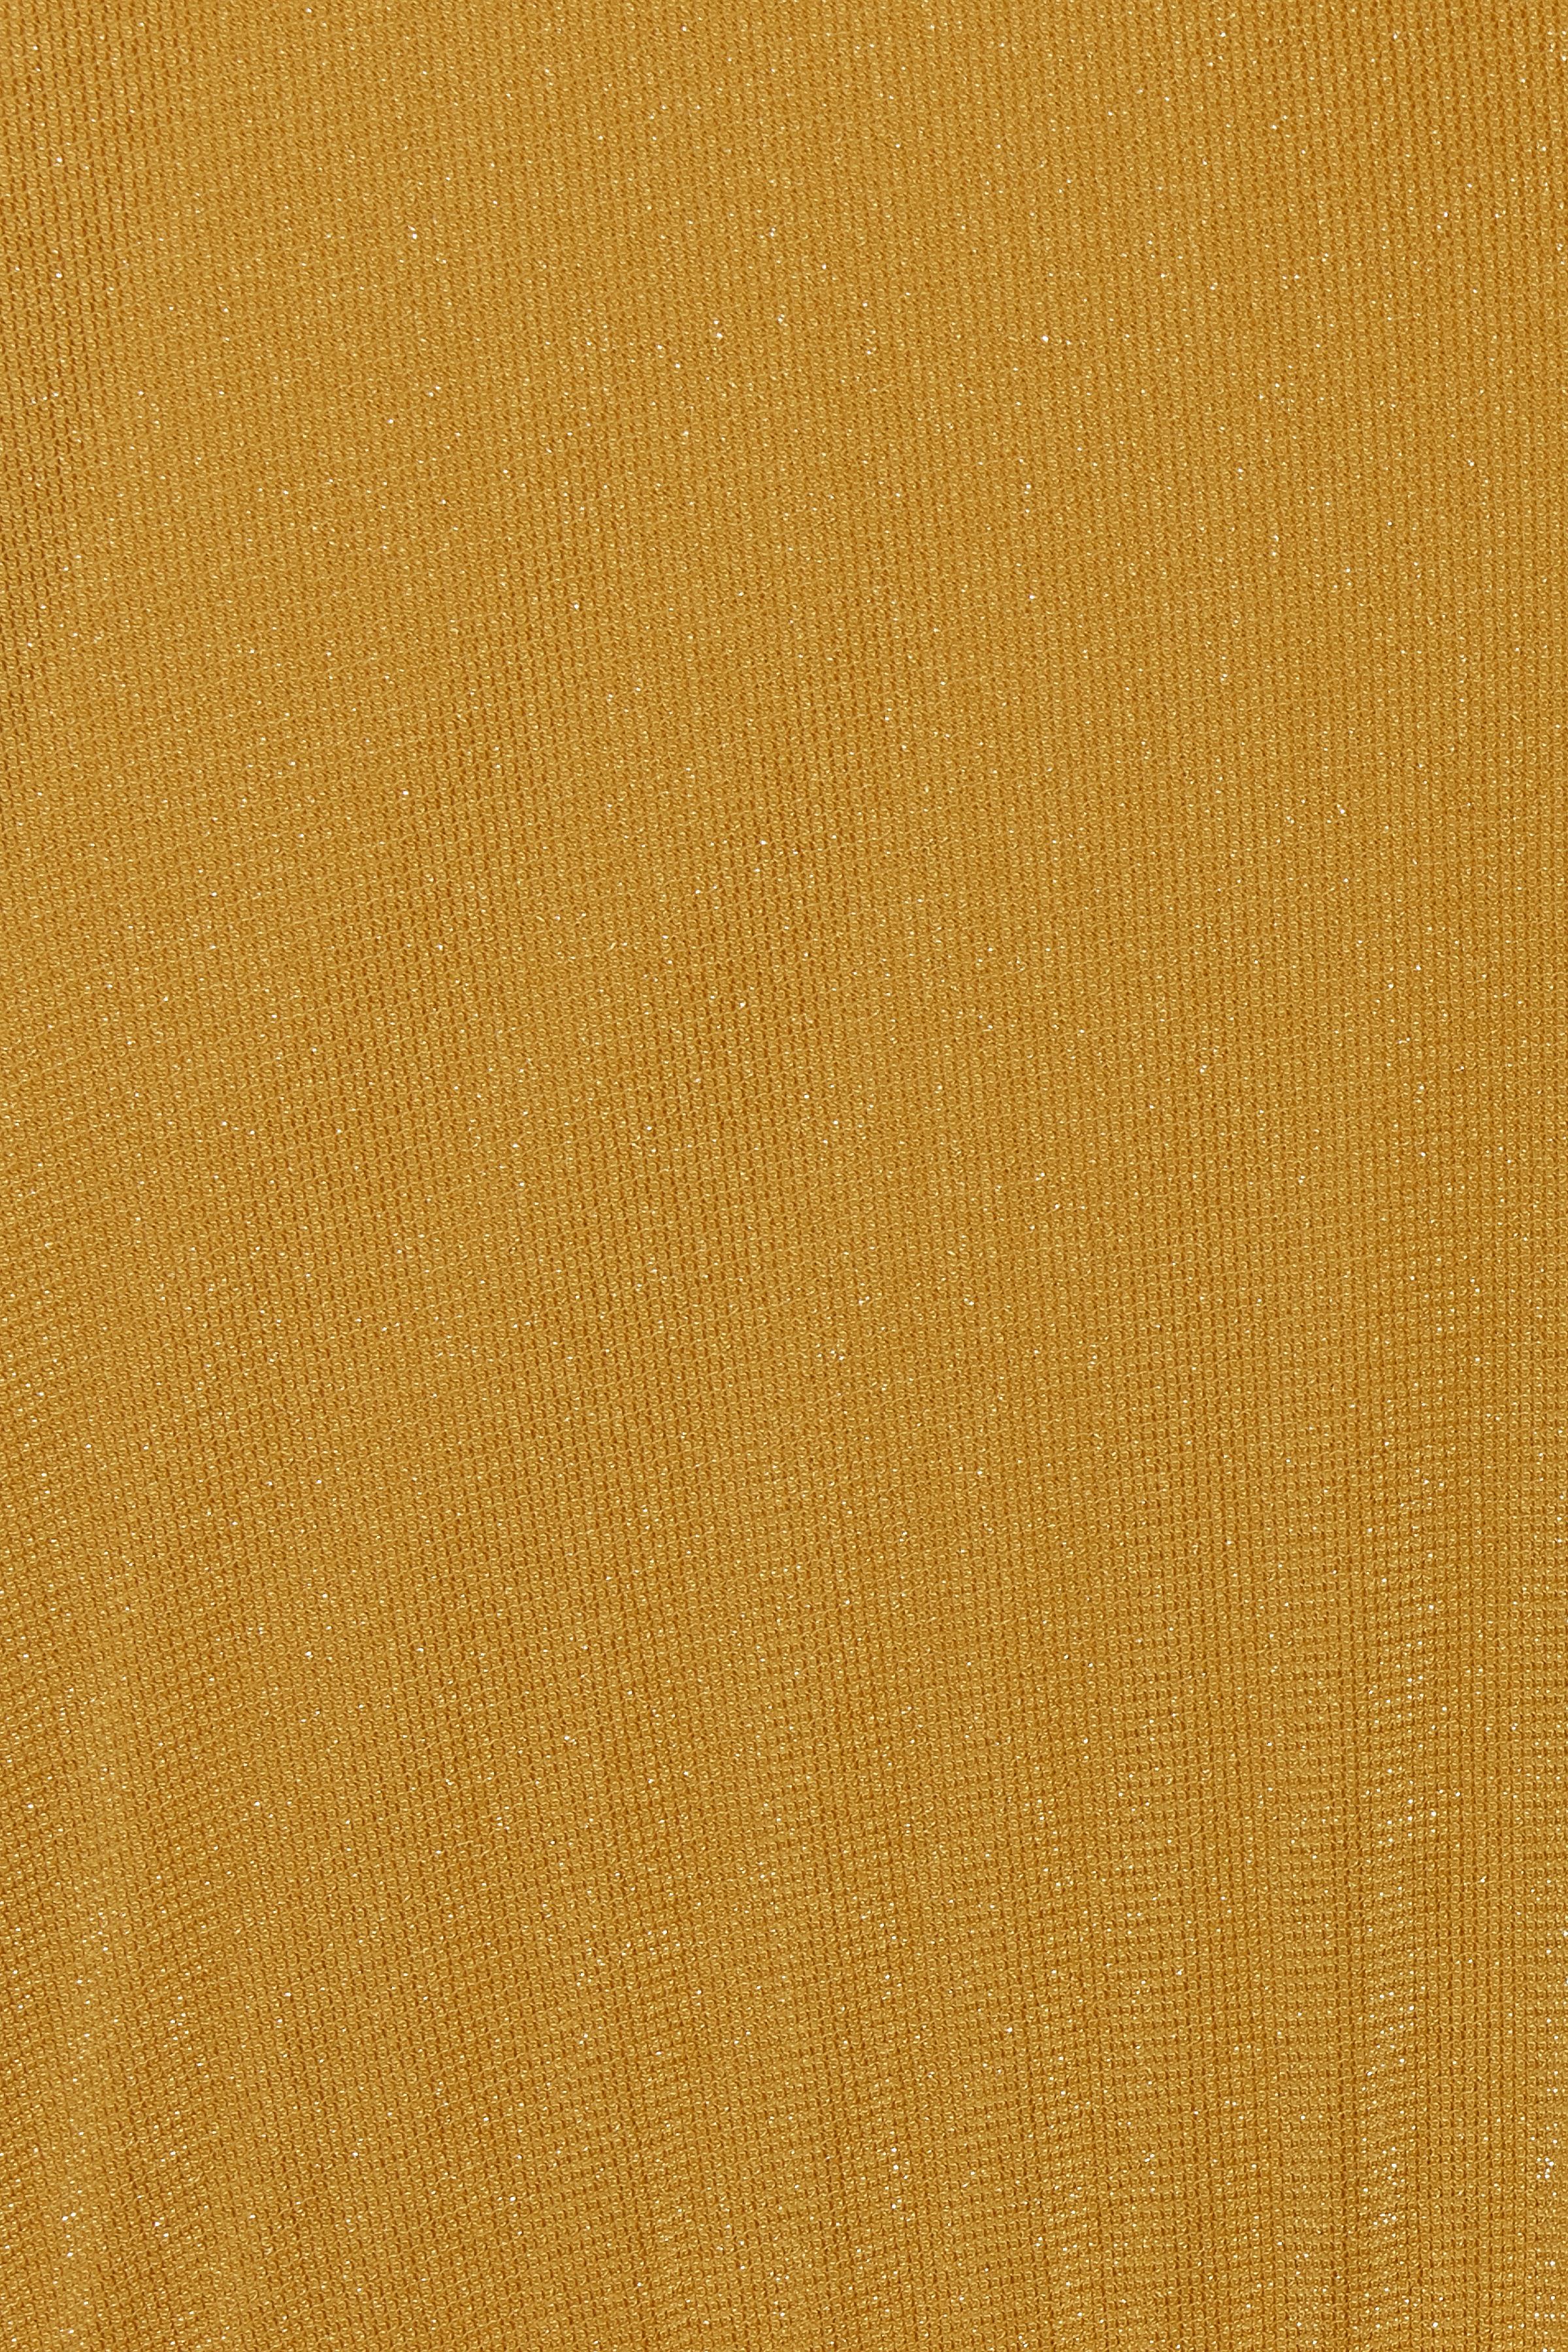 Golden Glow Jerseykjole fra b.young – Køb Golden Glow Jerseykjole fra str. XS-XL her